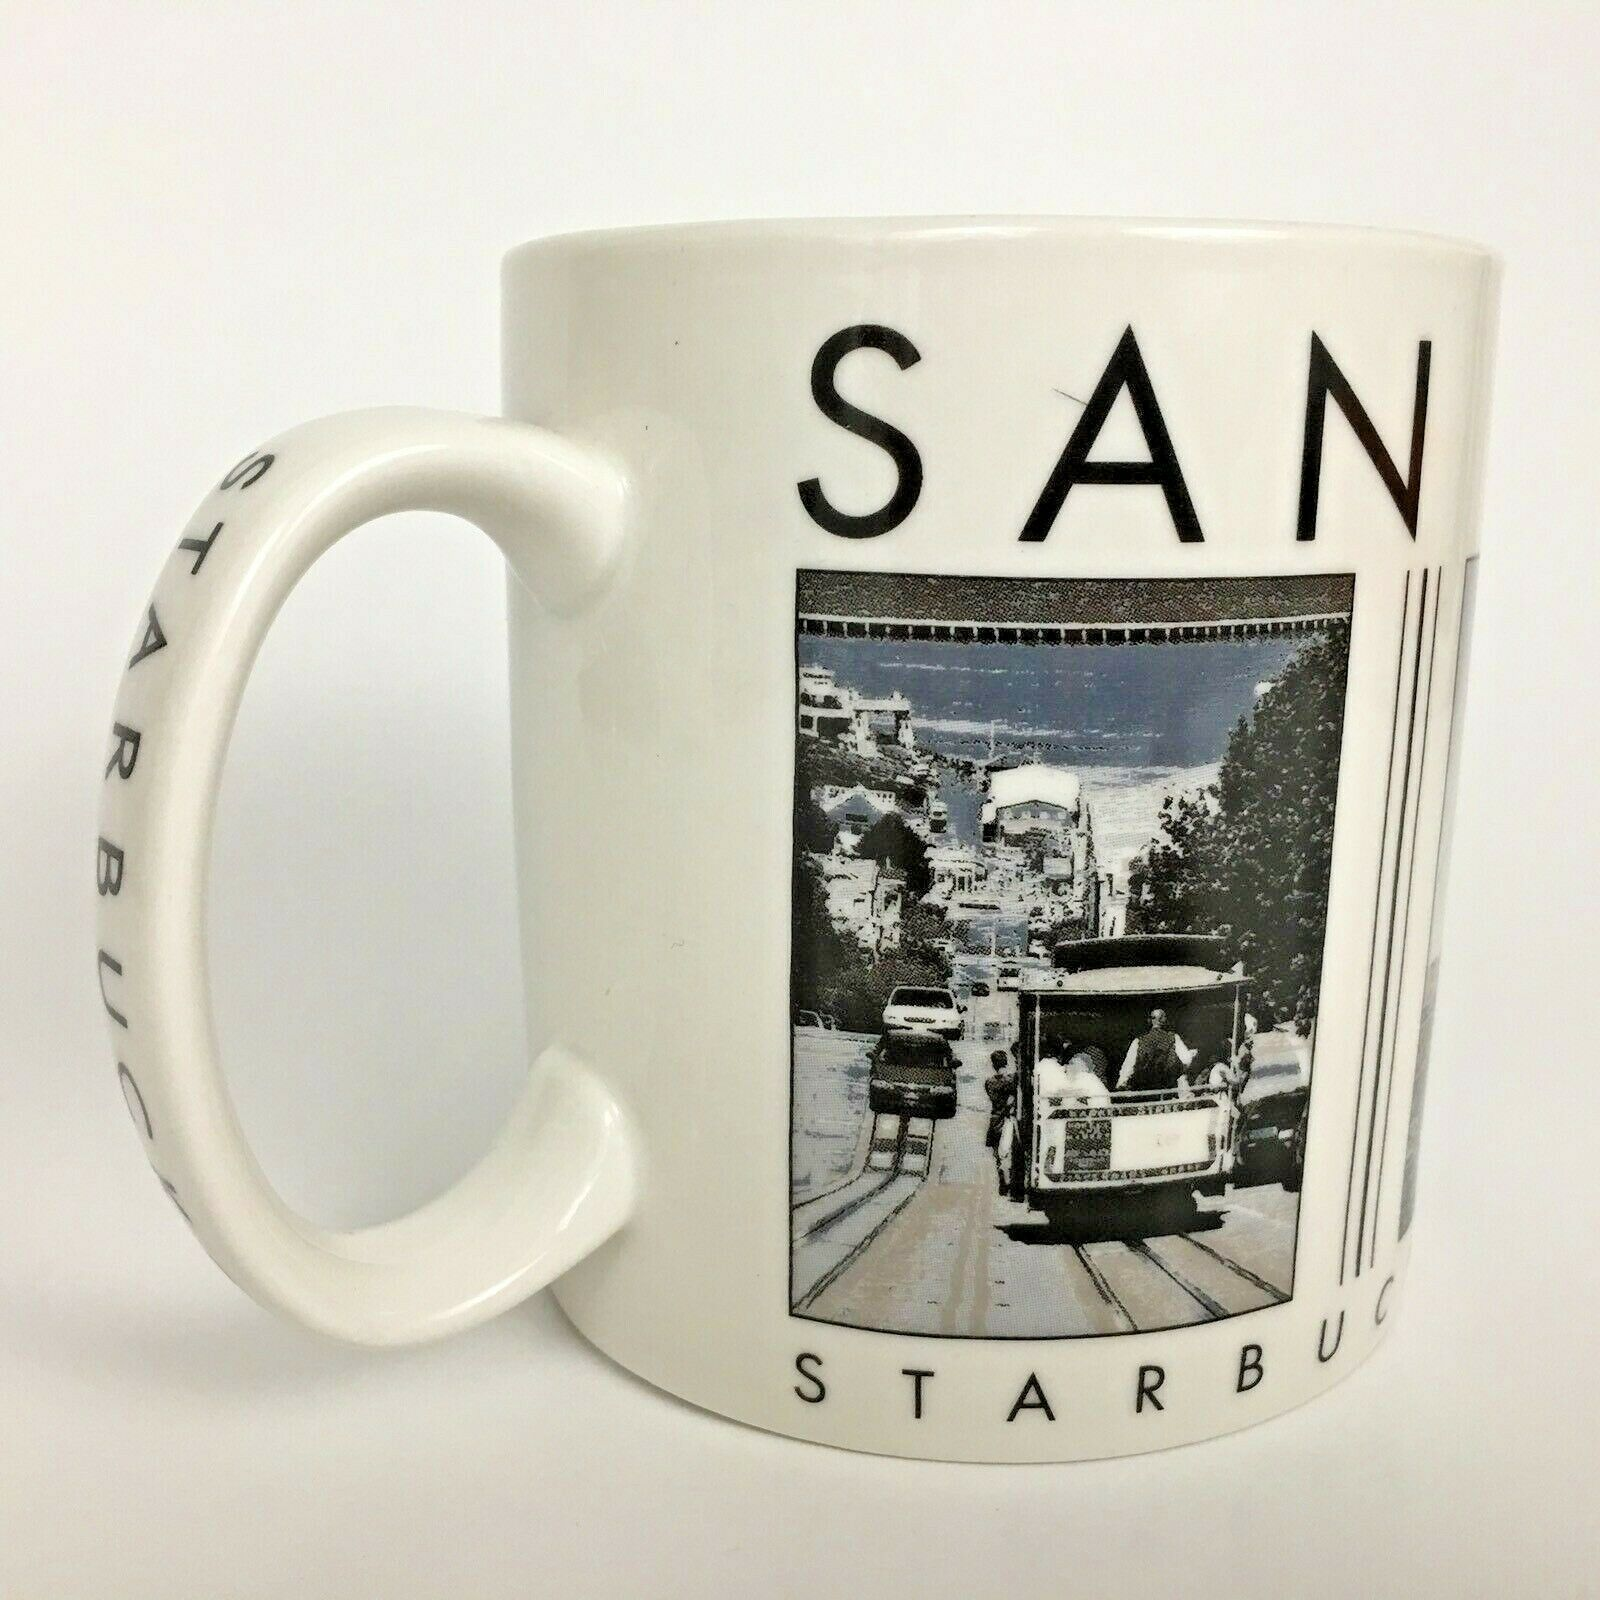 2005 Starbucks San Francisco Coffee Mug City Scenes Series 18 OZ Barista Cup - $14.31